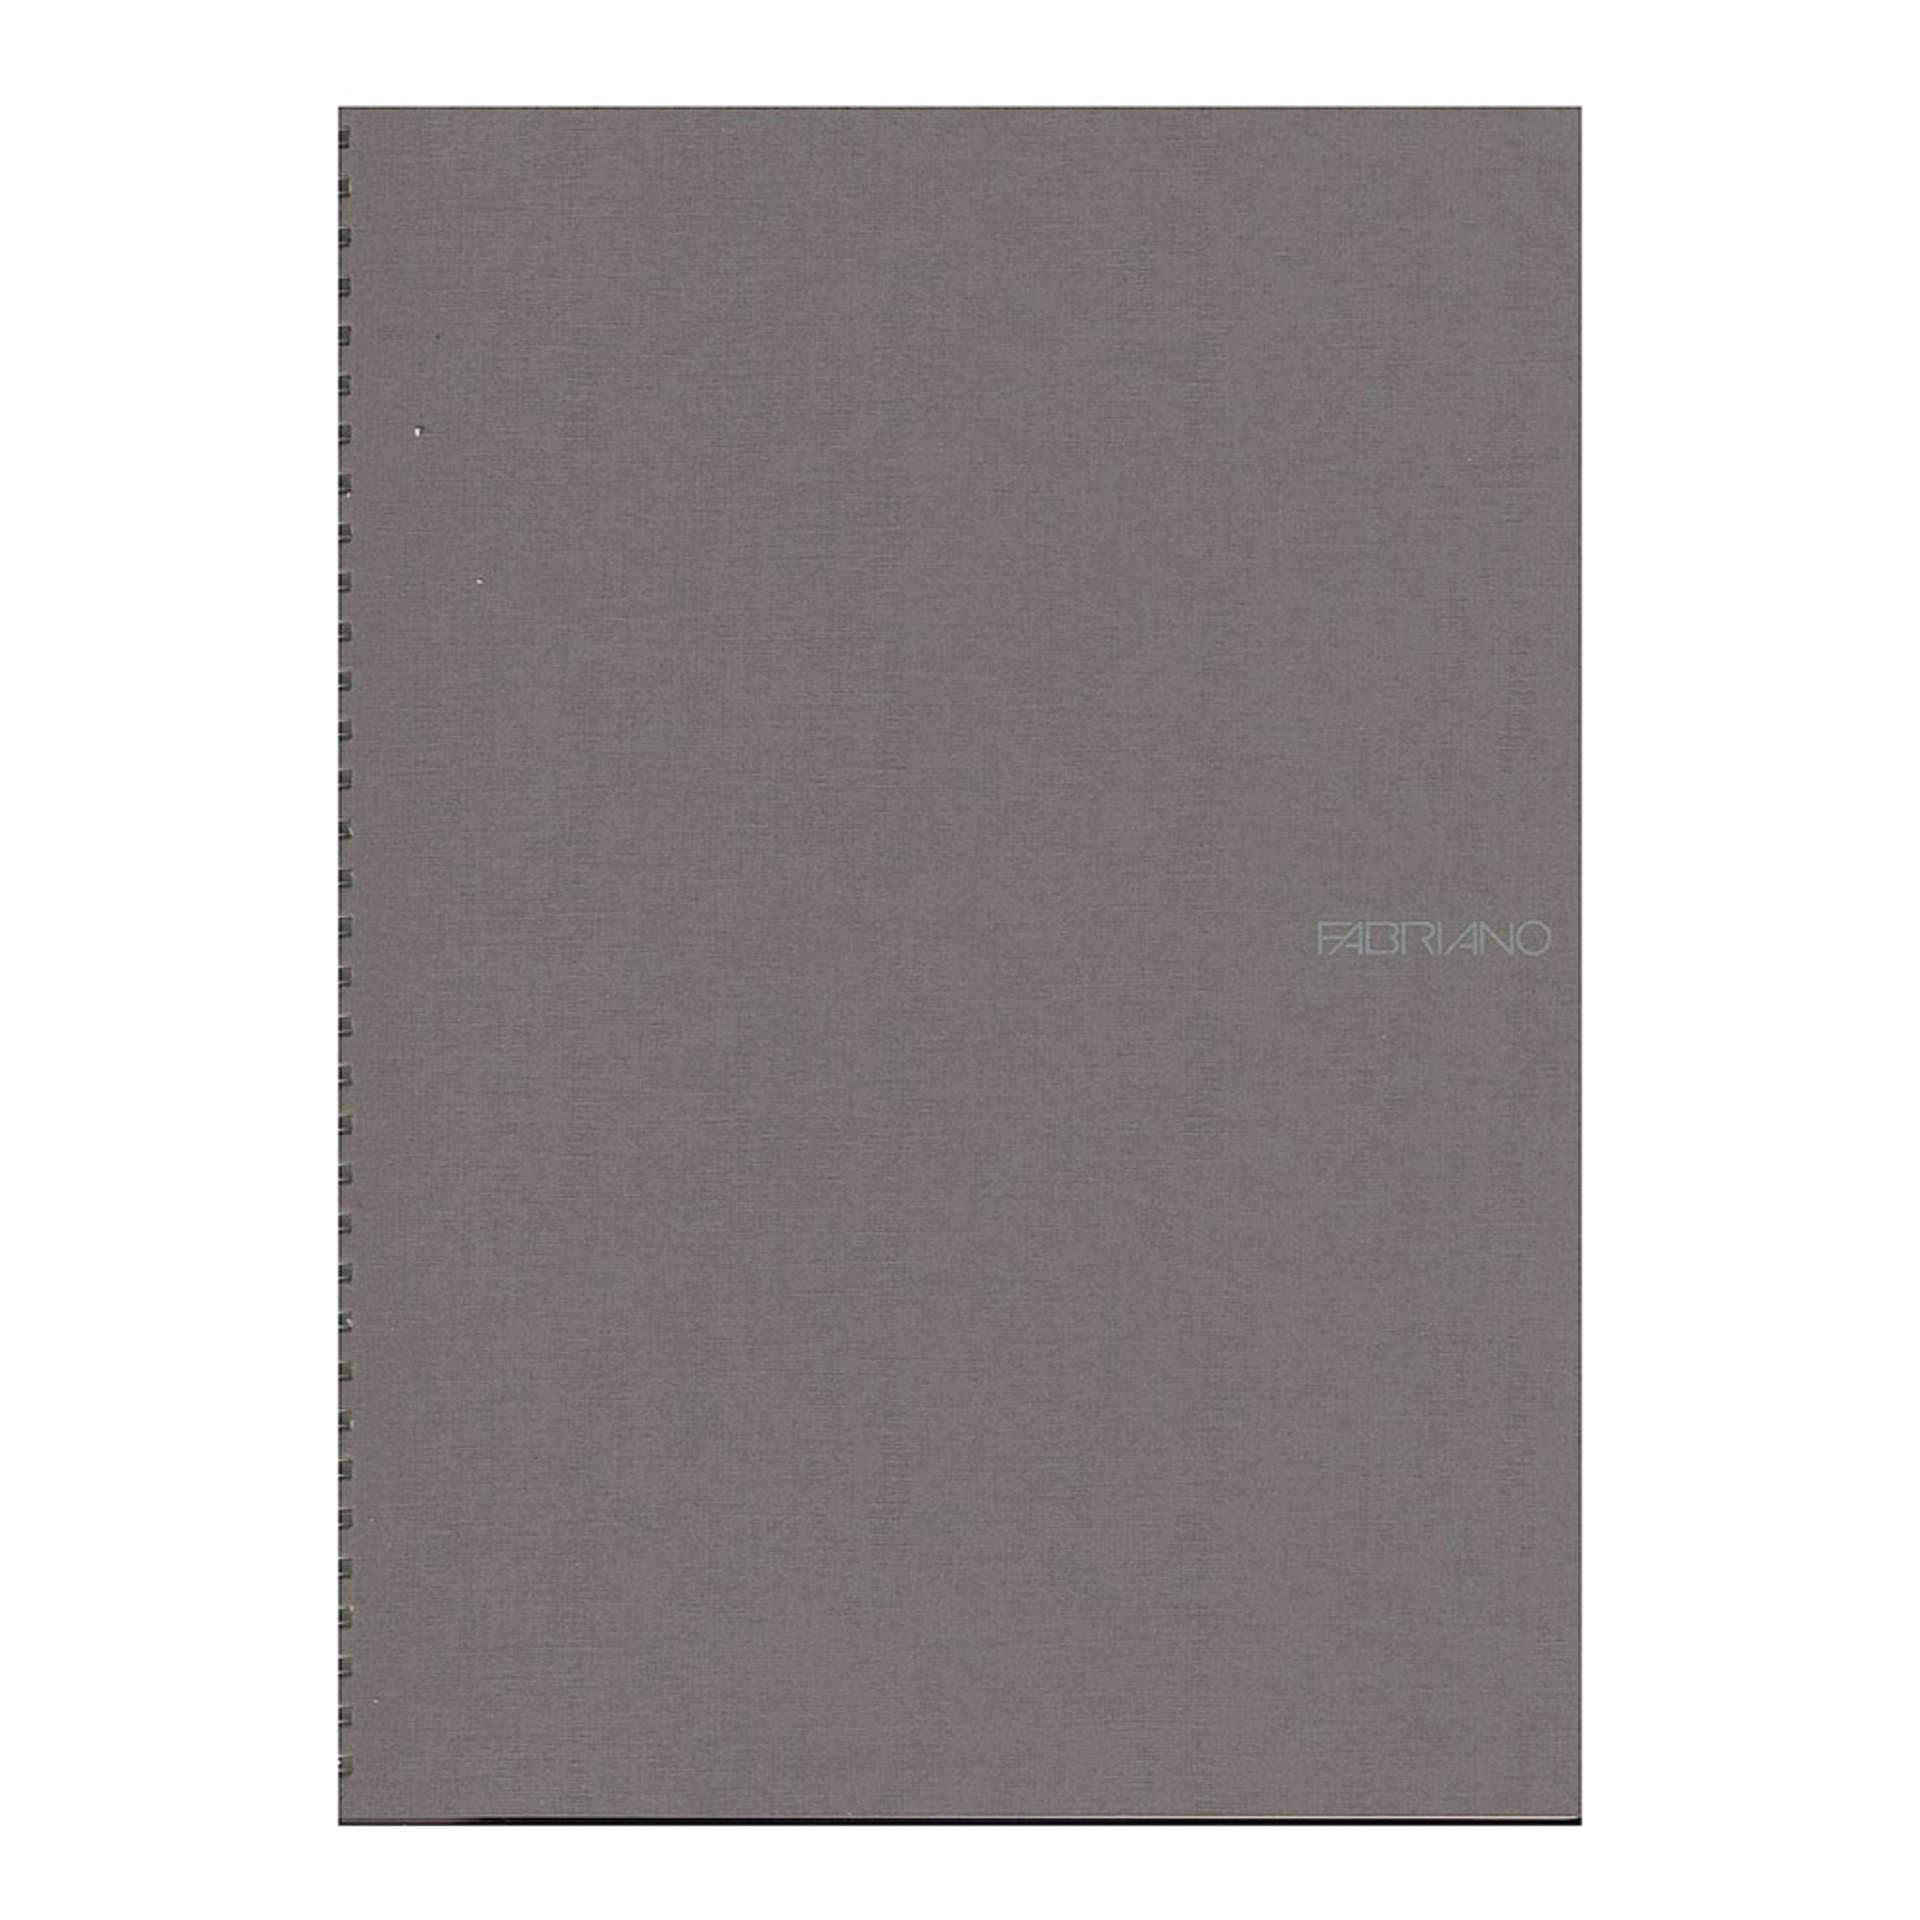 "Fabriano EcoQua Wire Bound Blank 8""x11"" Notebook Stone"